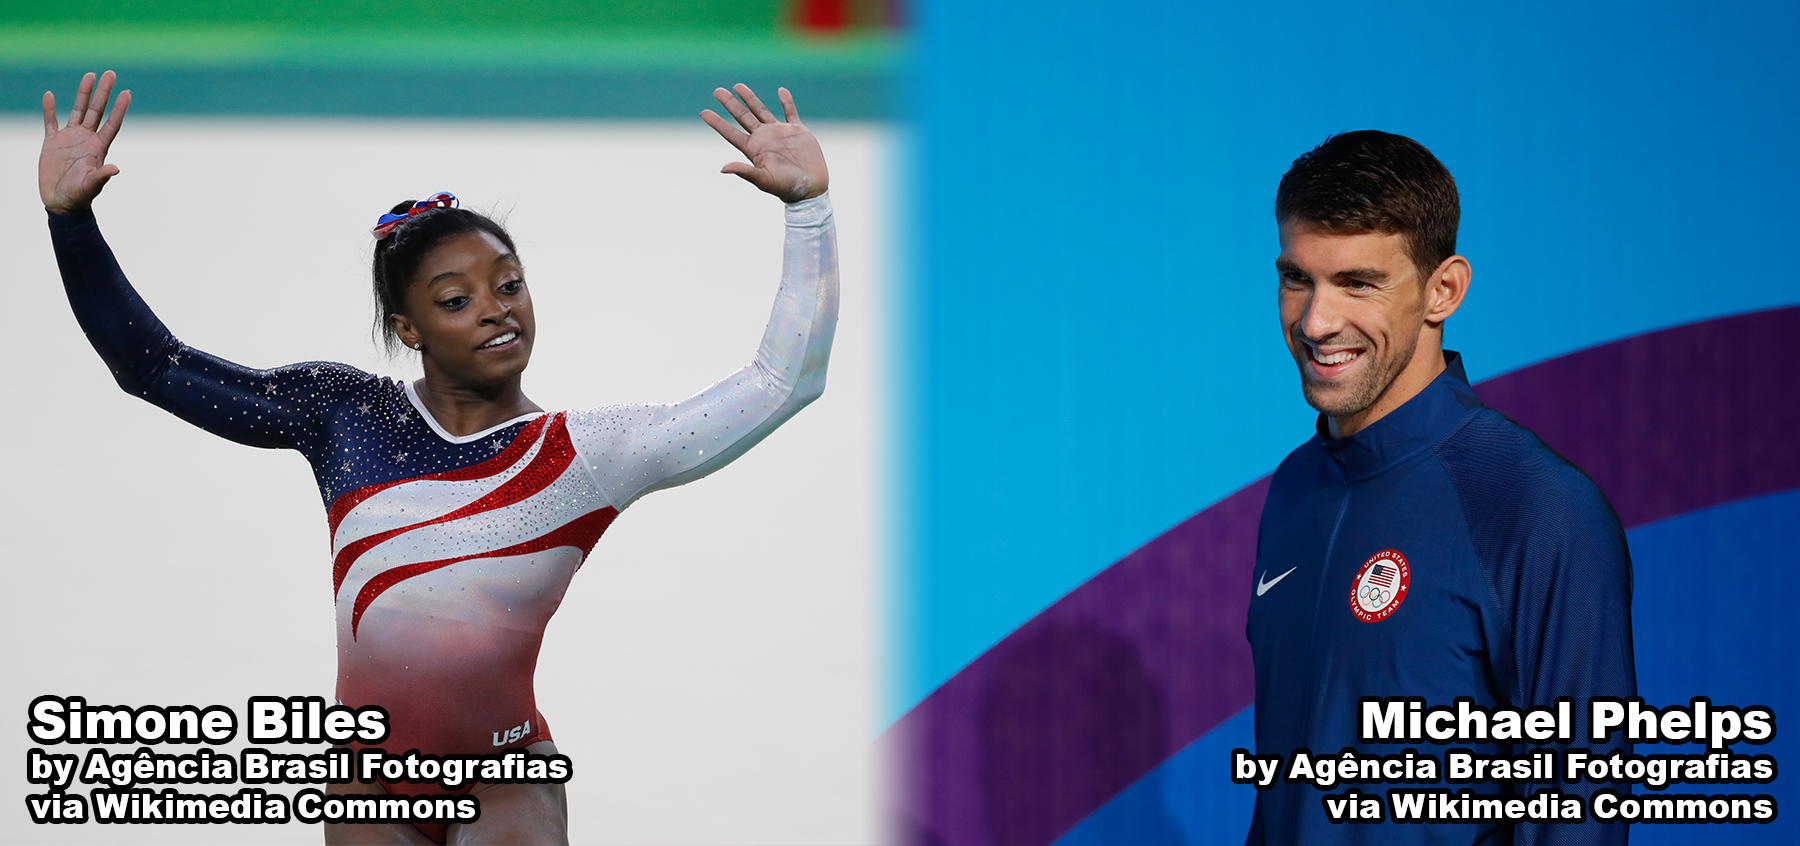 Simone Biles and Michael Phelps